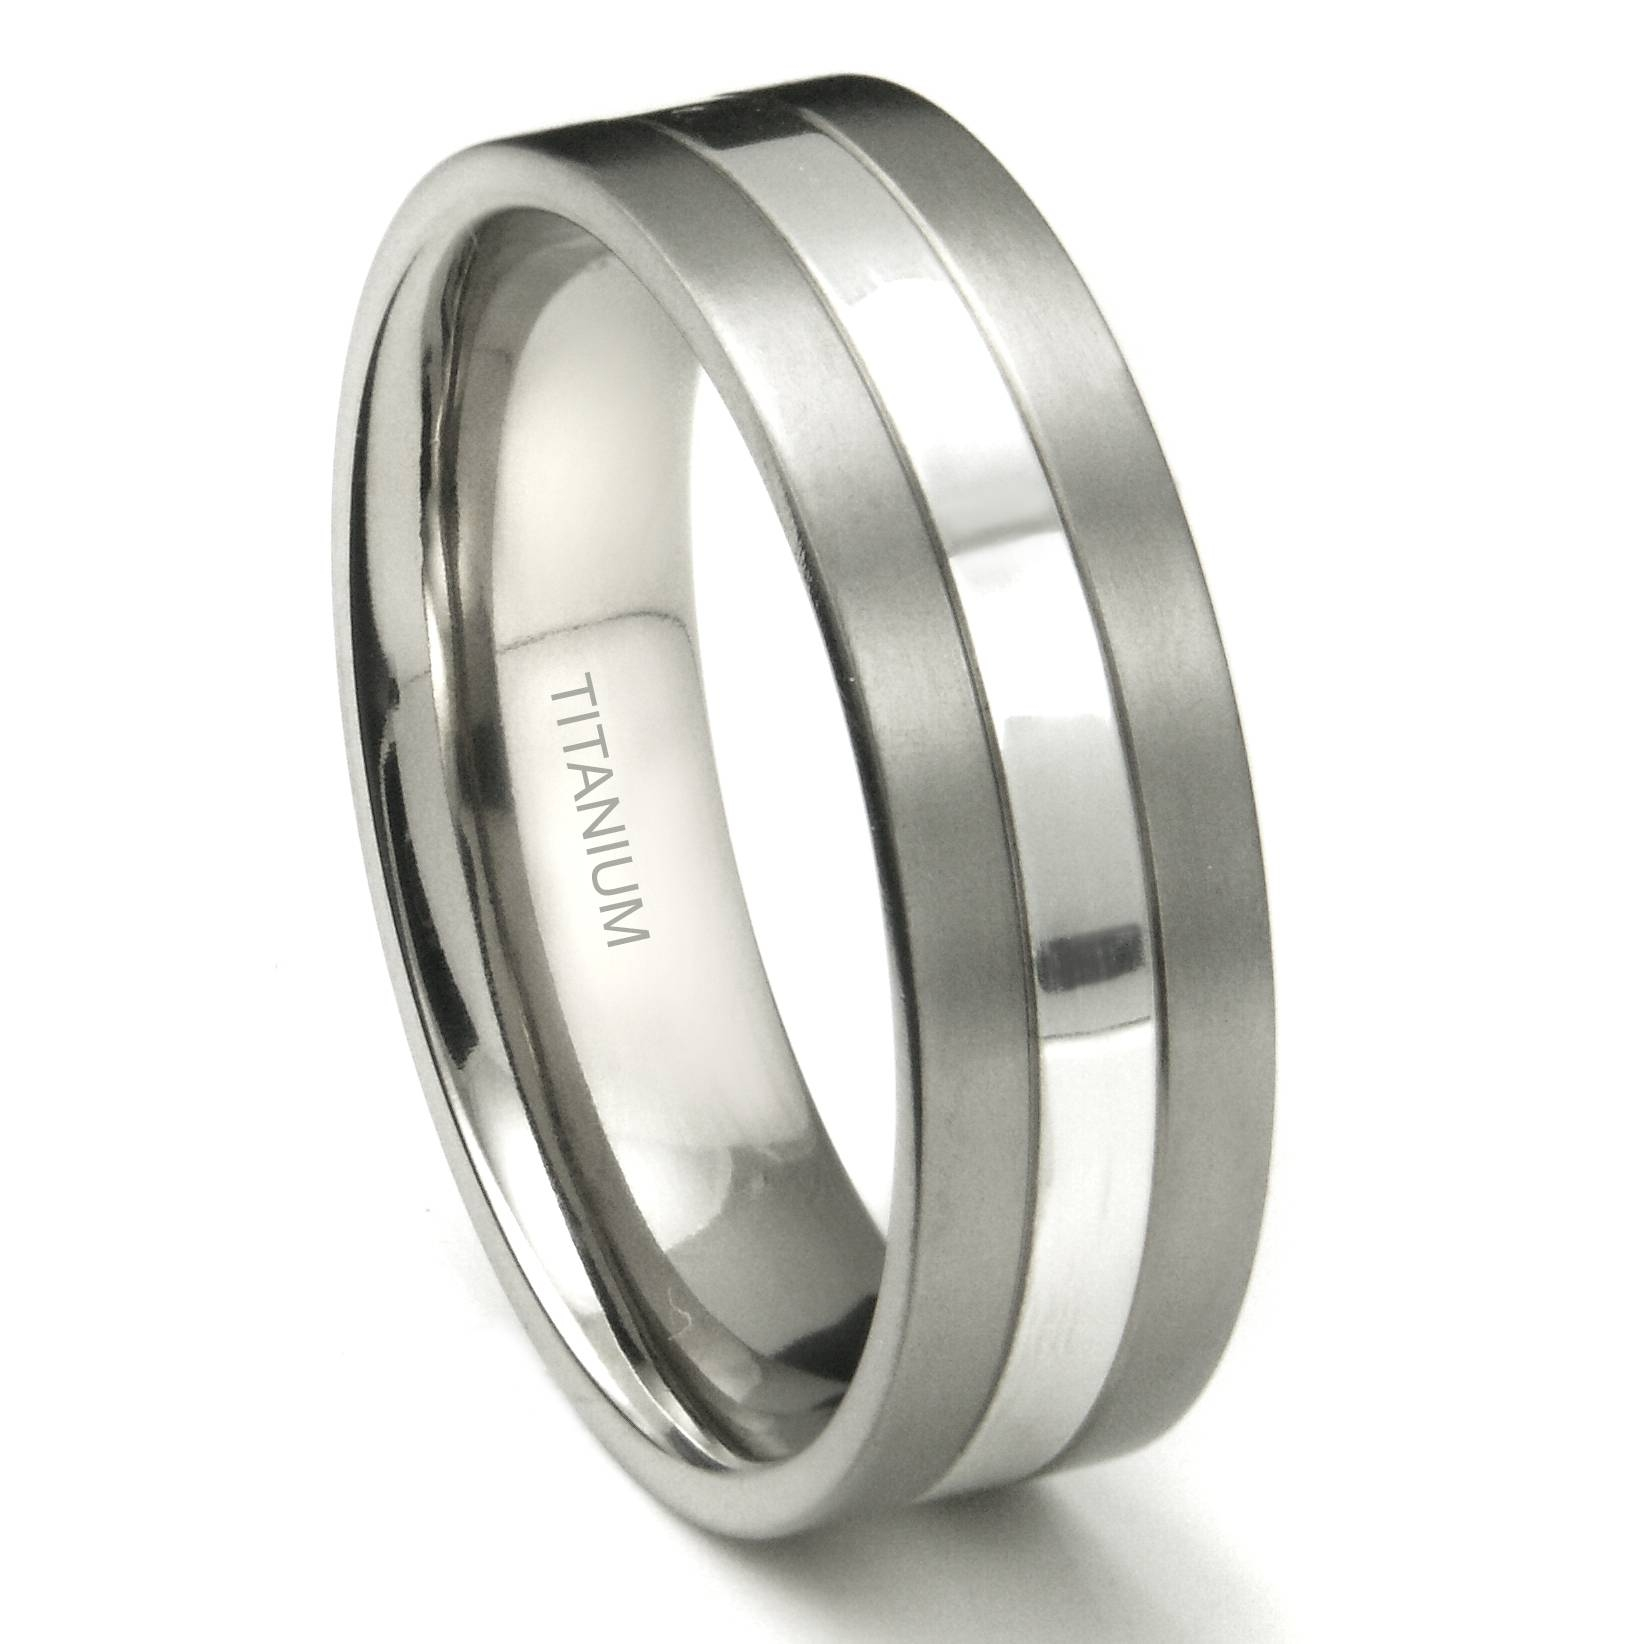 Titanium 7Mm Two Tone Wedding Ring For Titanium Men Wedding Rings (View 10 of 15)